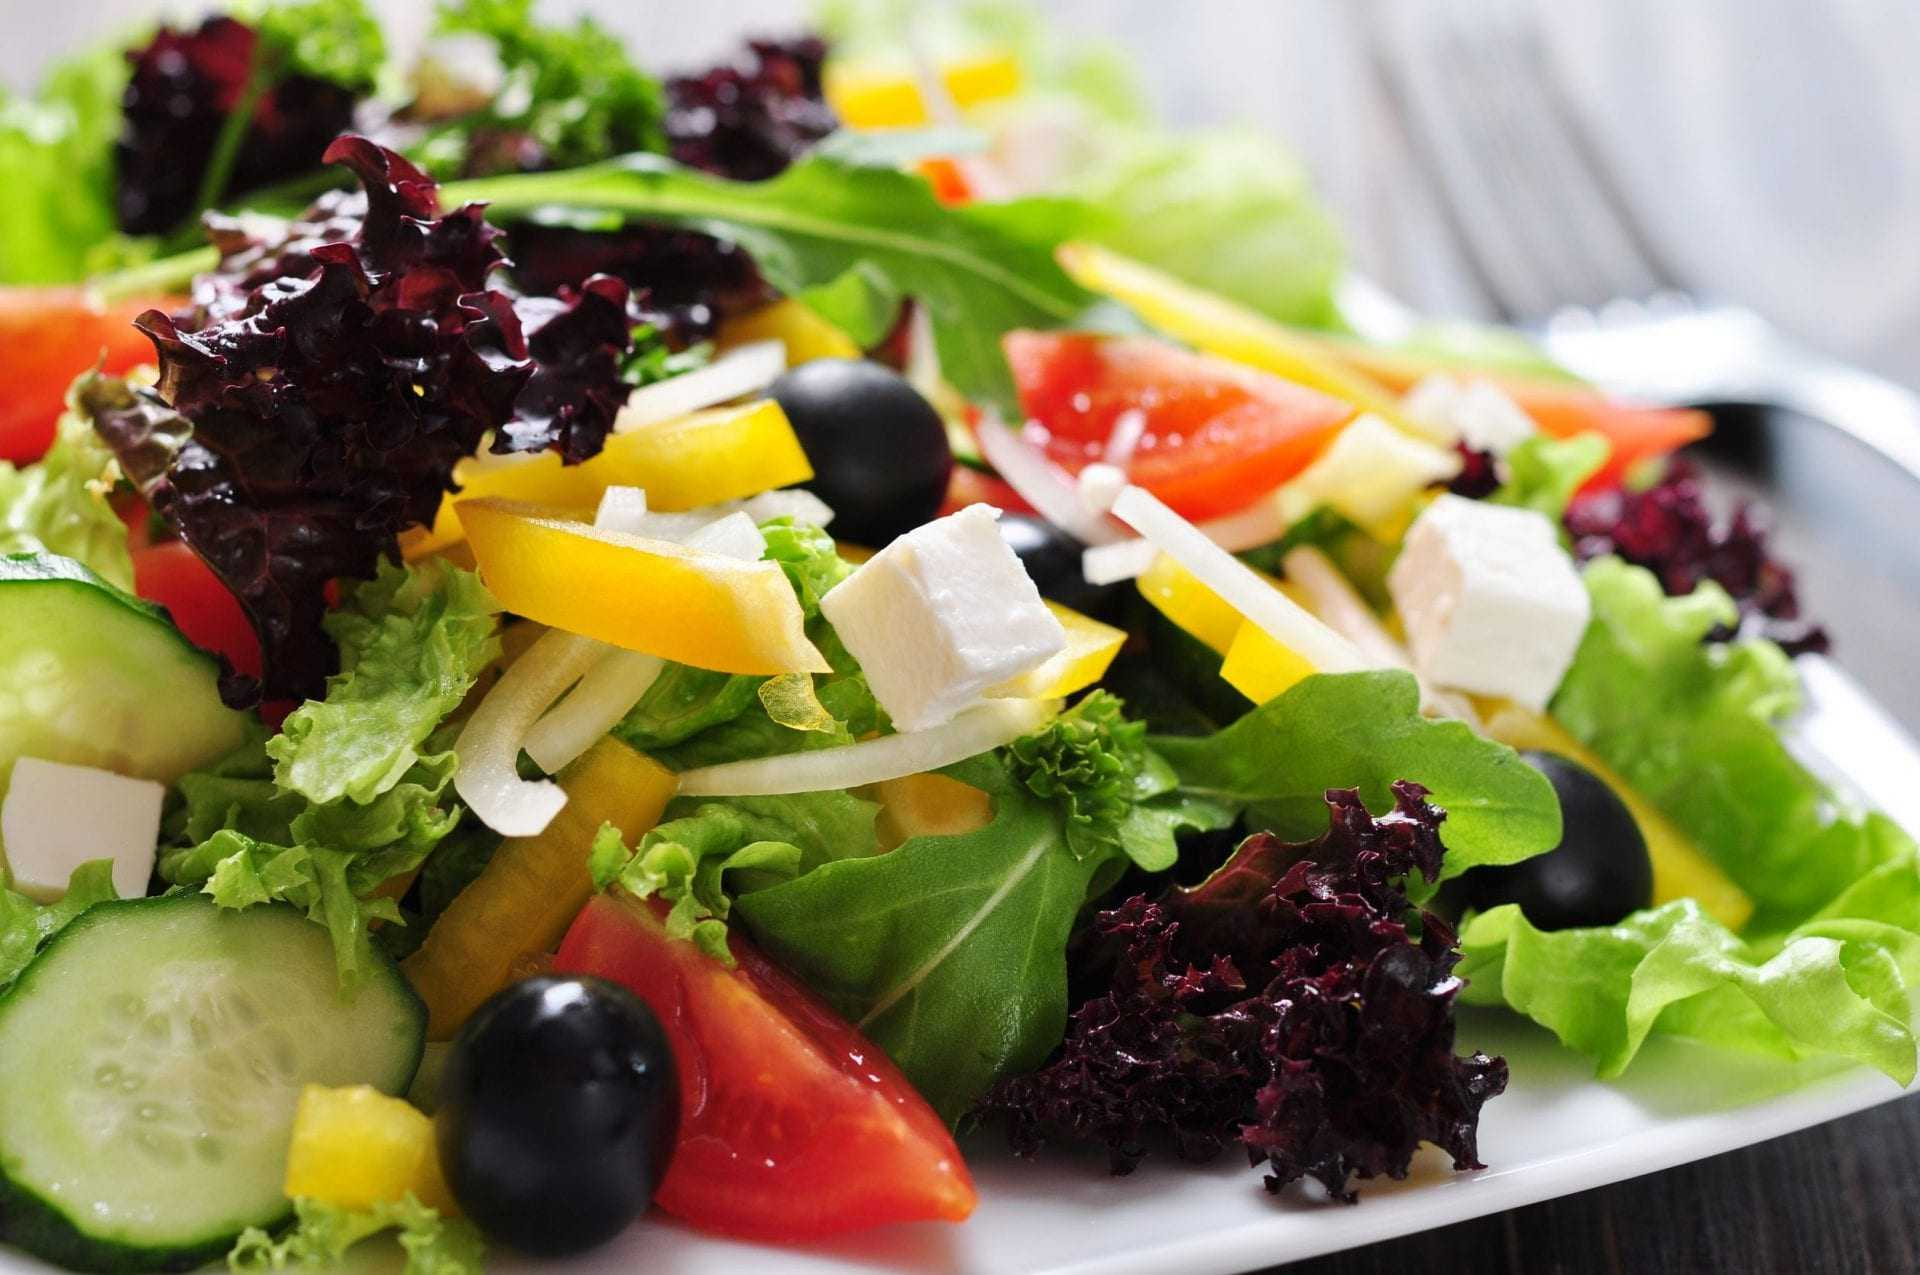 insalata-greca-è-trend-olio-d'oliva-tempi